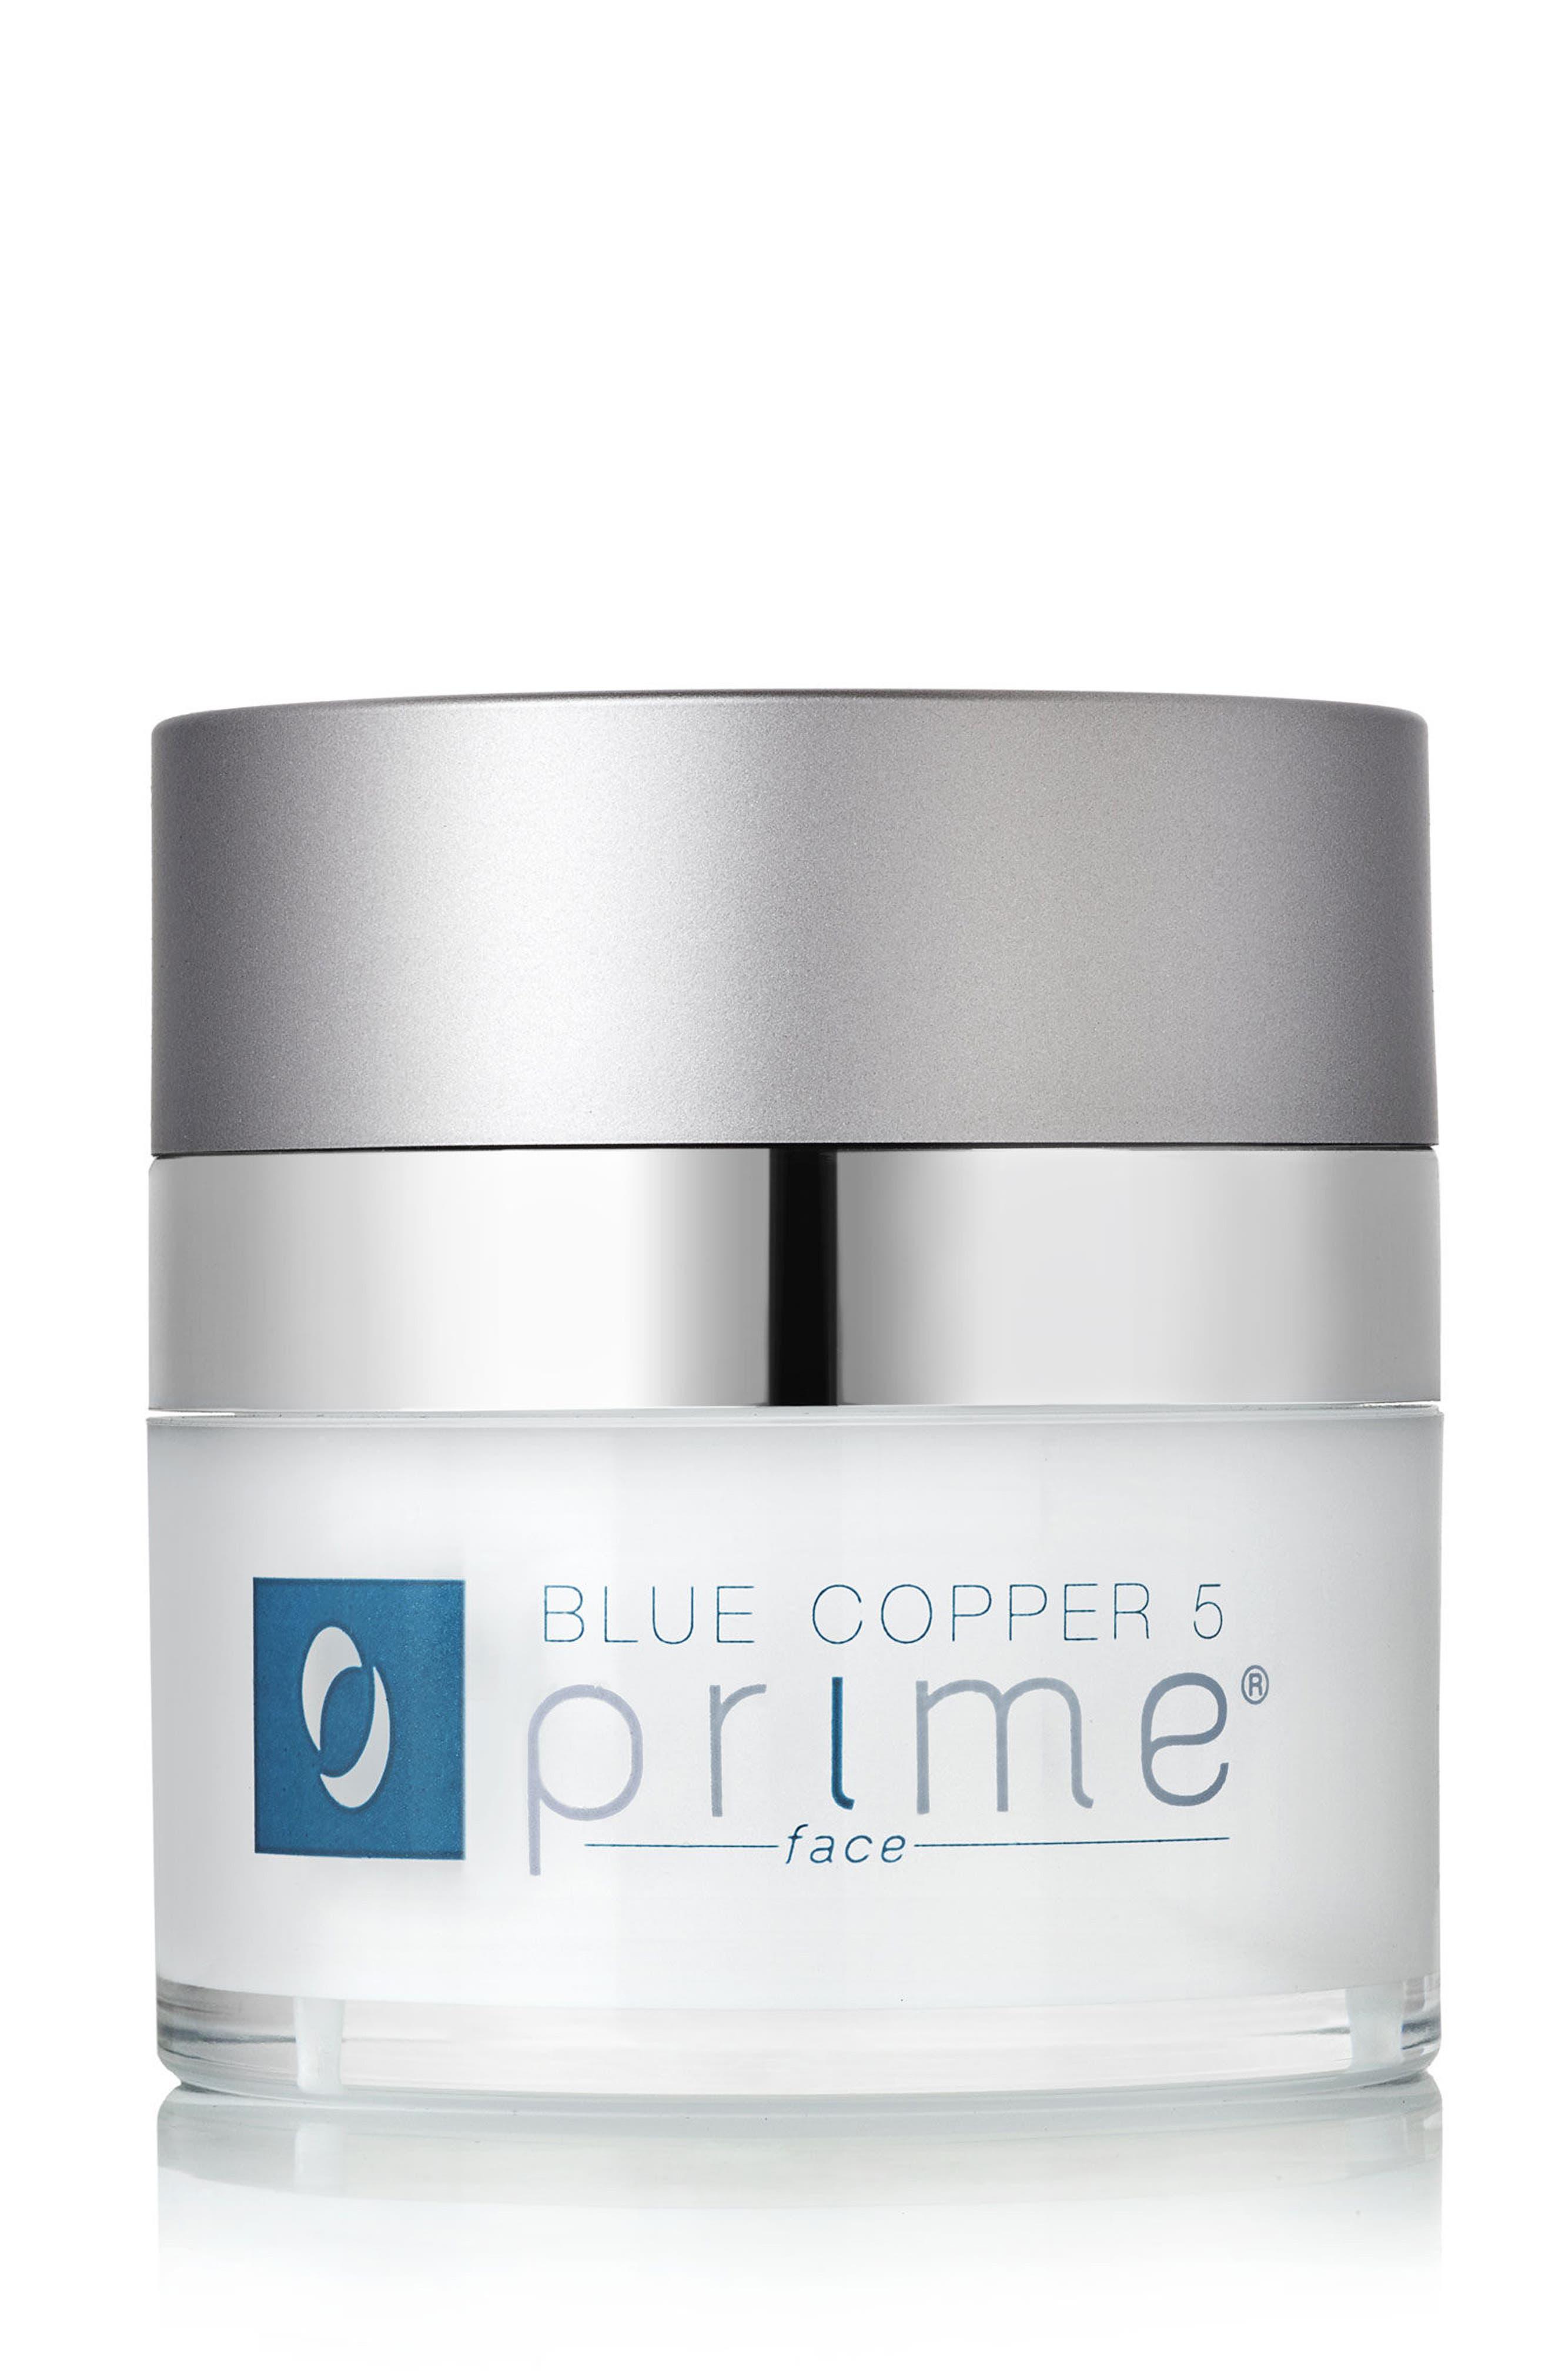 OSMOTICS COSMECEUTICALS, Blue Copper 5 Prime for Face, Alternate thumbnail 2, color, NO COLOR